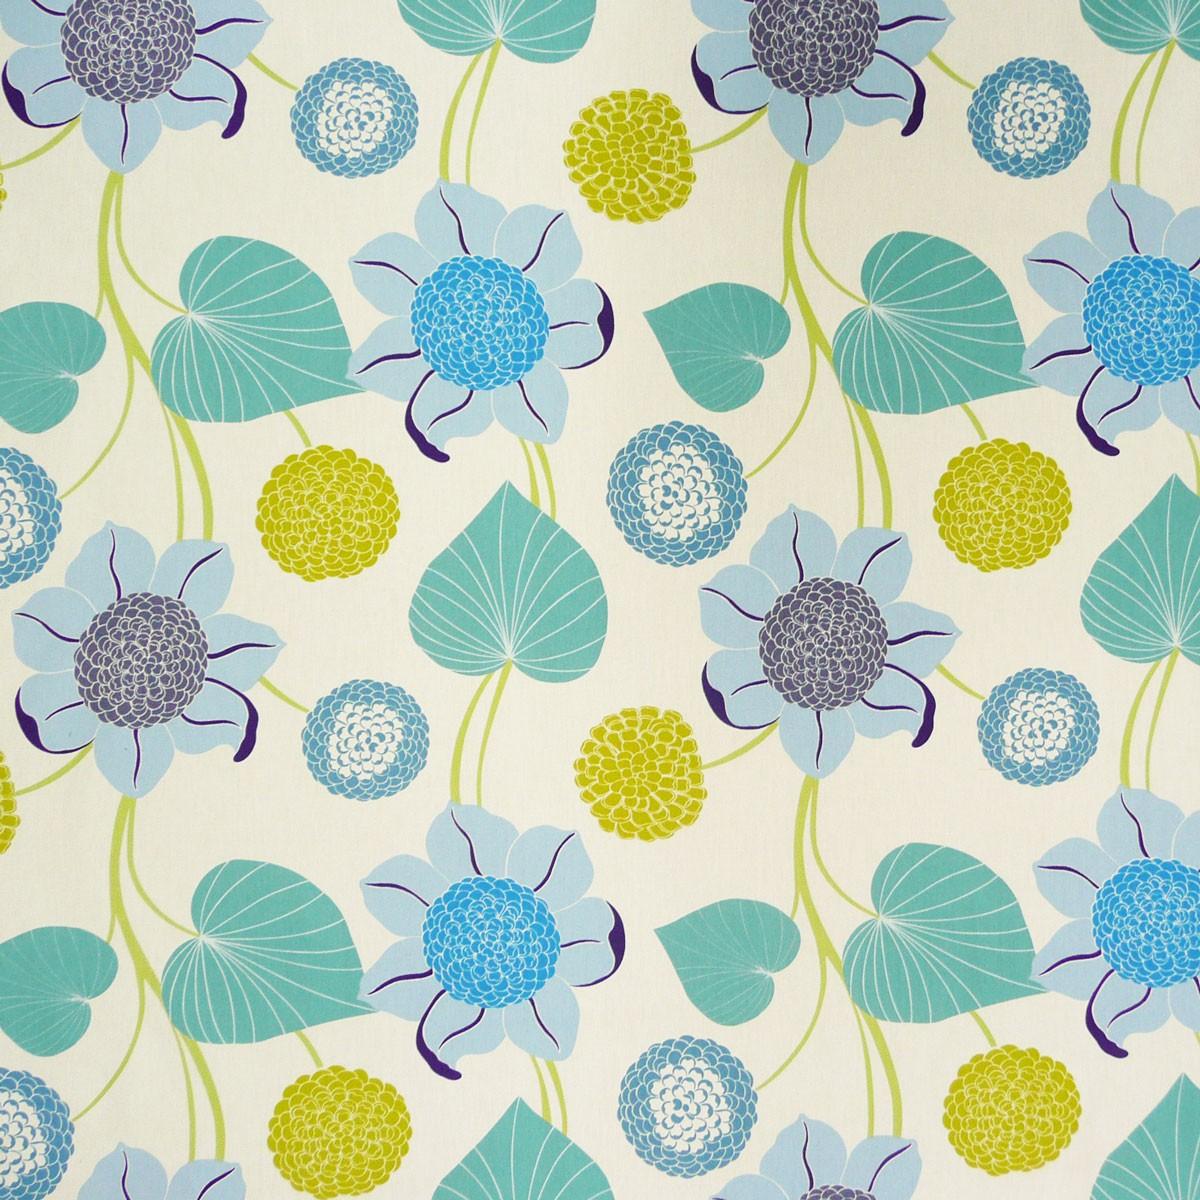 baumwollstoff deko stoff gardinenstoff delilah blumen blau gr n stoffe stoffe gemustert stoff blumen. Black Bedroom Furniture Sets. Home Design Ideas